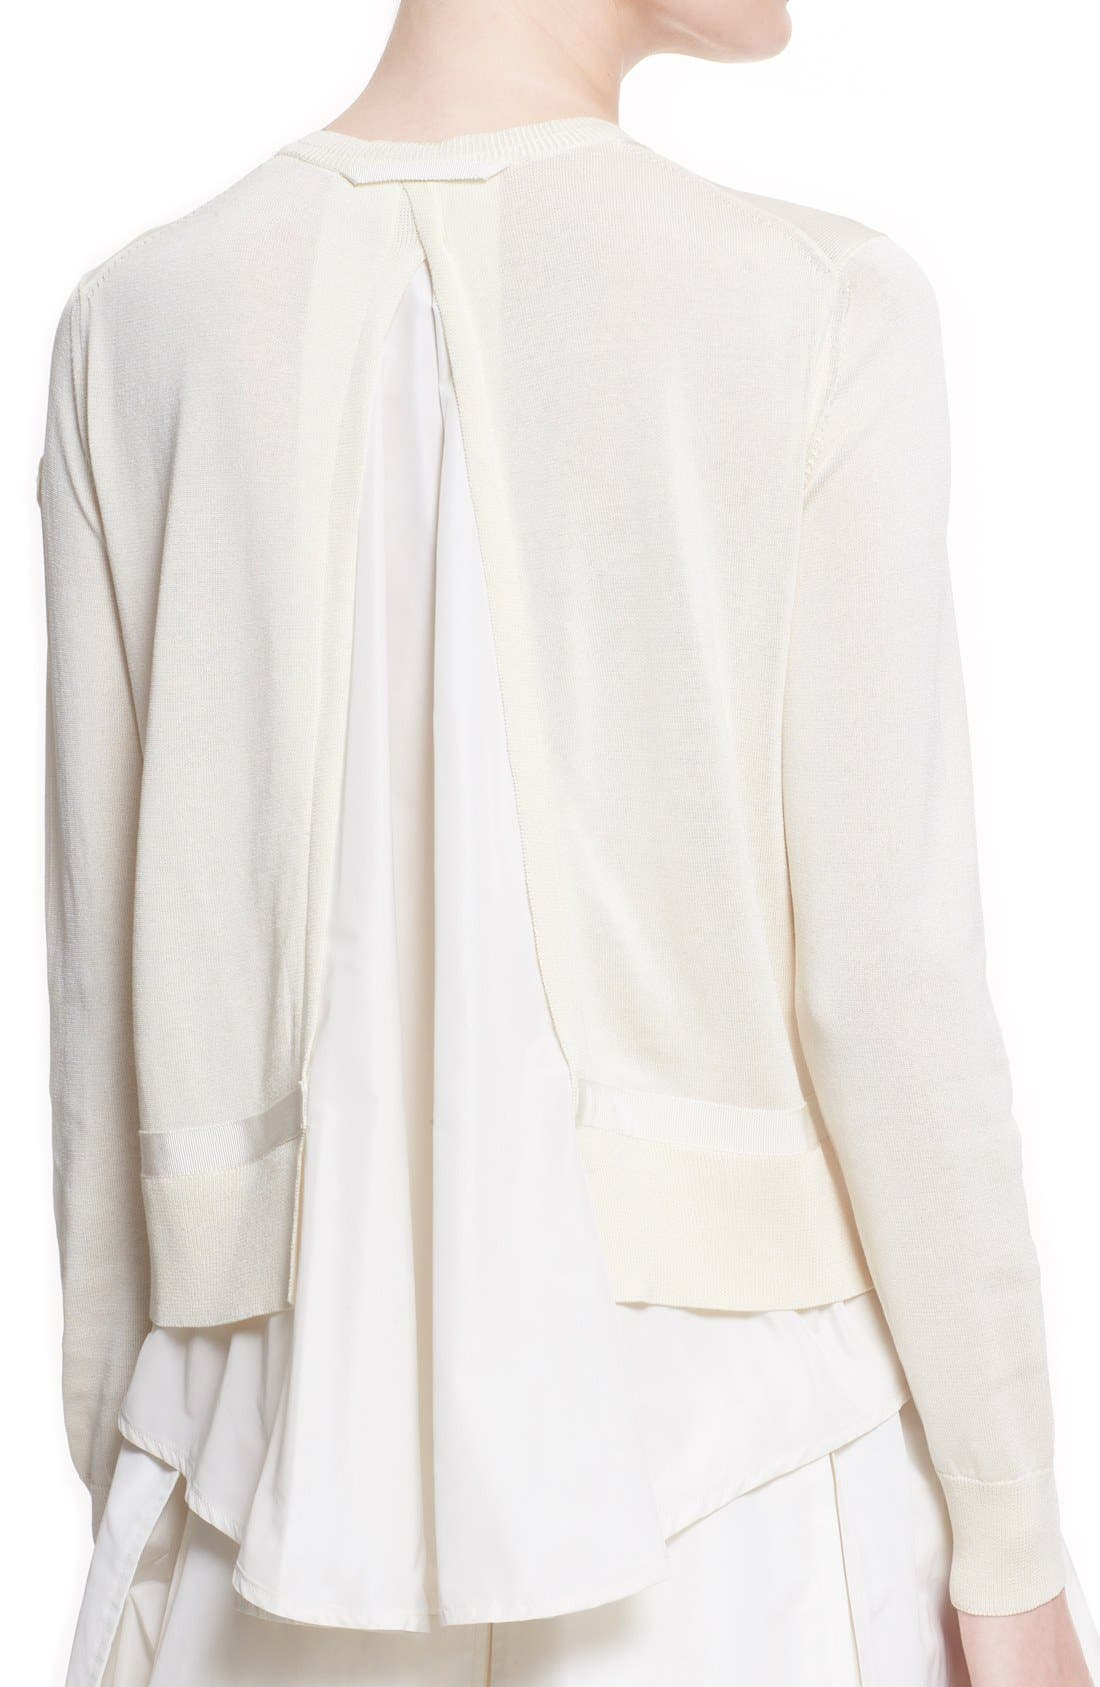 'Maglia' Tricot Button Cardigan,                             Alternate thumbnail 6, color,                             WHITE